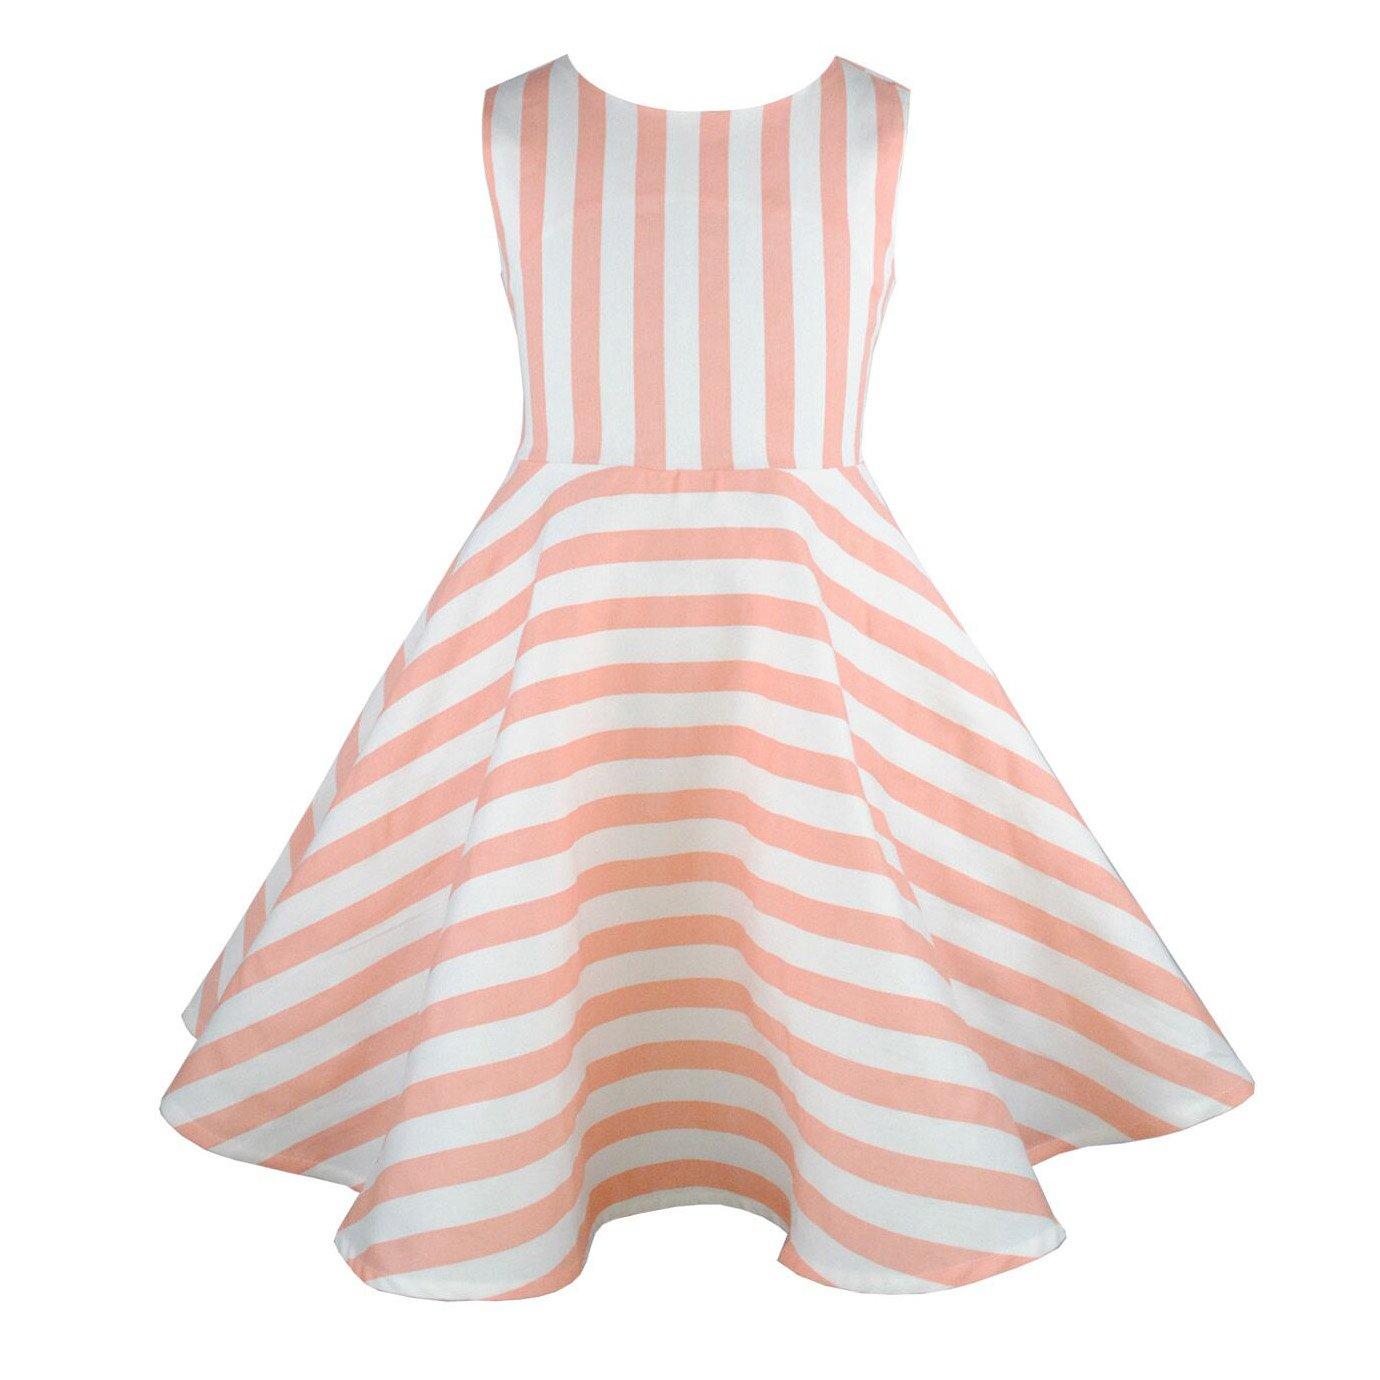 HCABL Girls Casual Sleeveless Swing Dress, Organic Cotton, Summer Stripe, 2T-16 Girls(5)